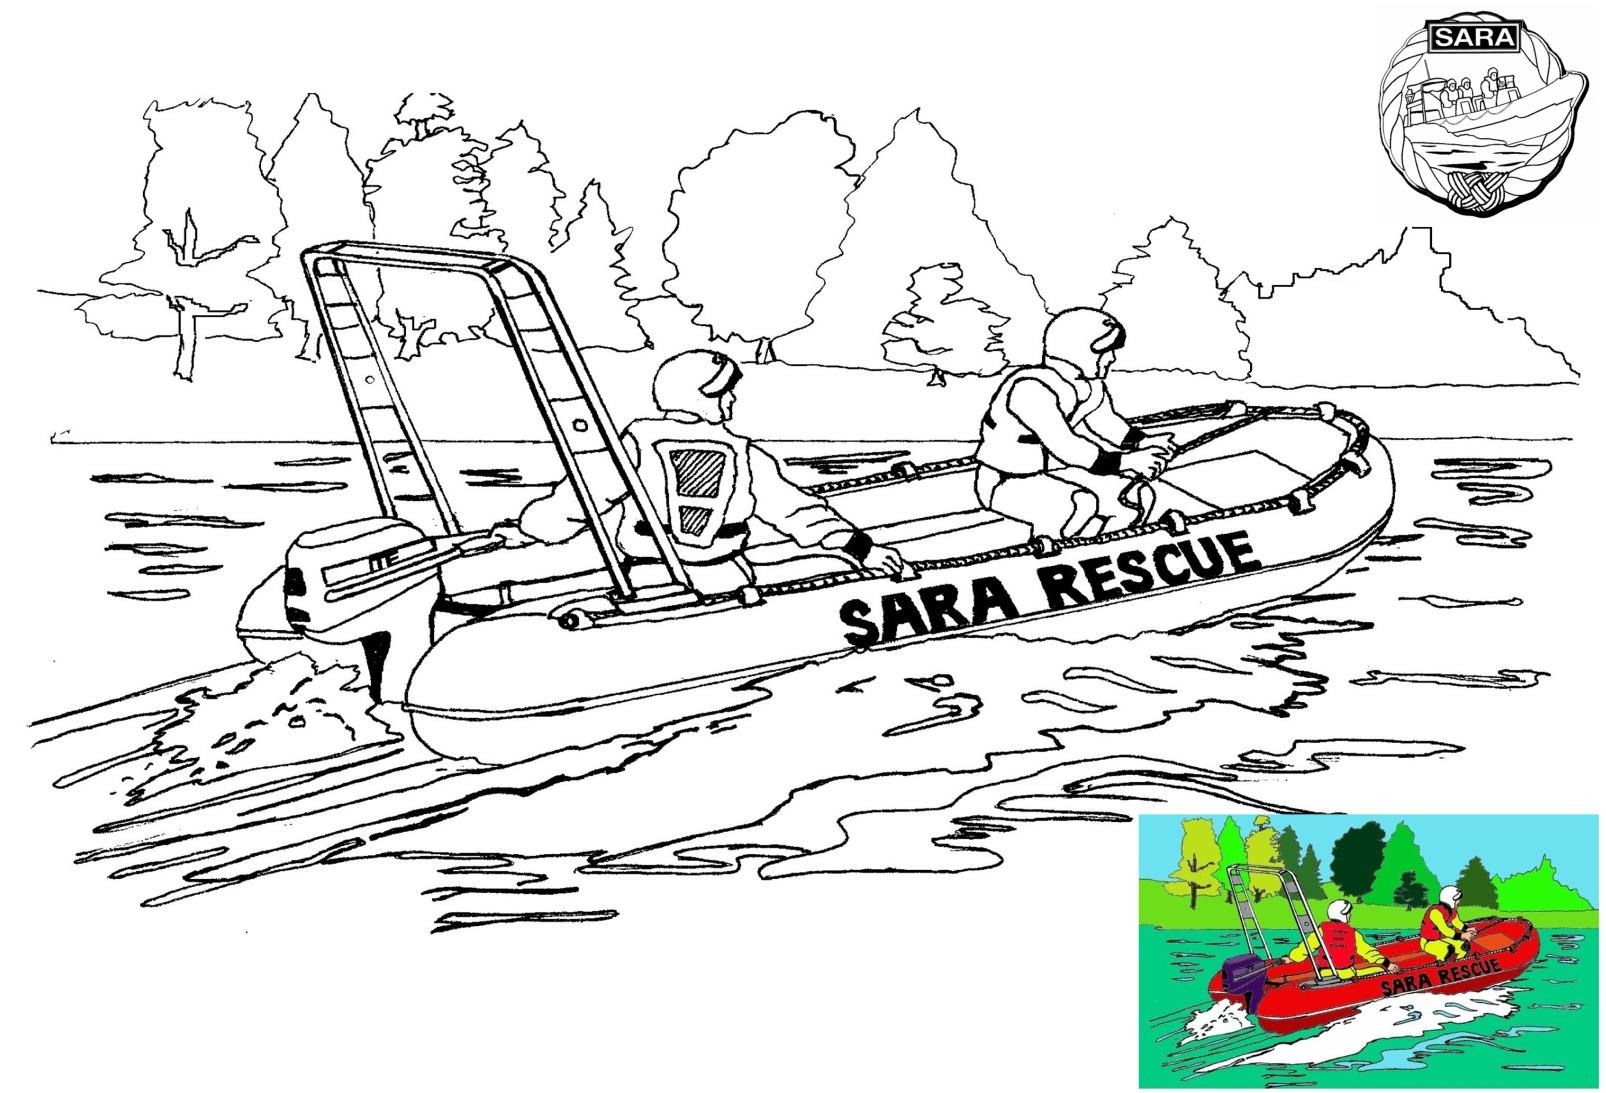 SARA Rescue Boat 19